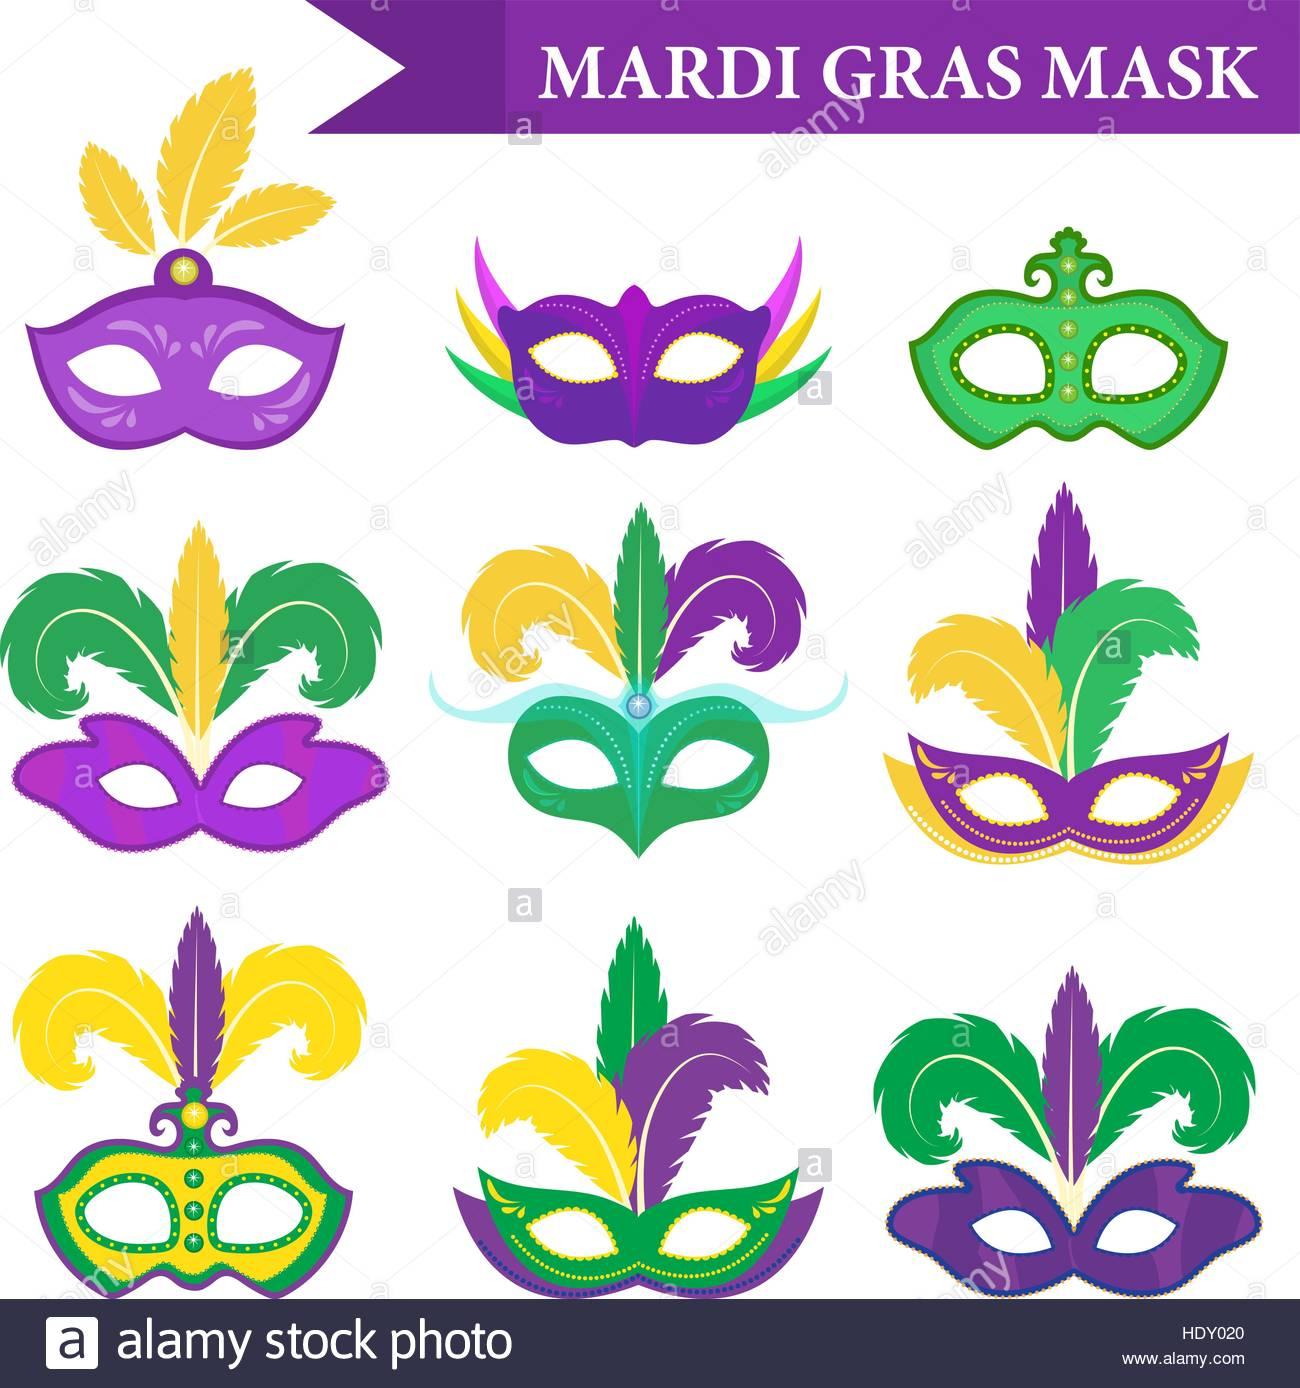 Mardi Gras mask set, design element, flat style. collection.